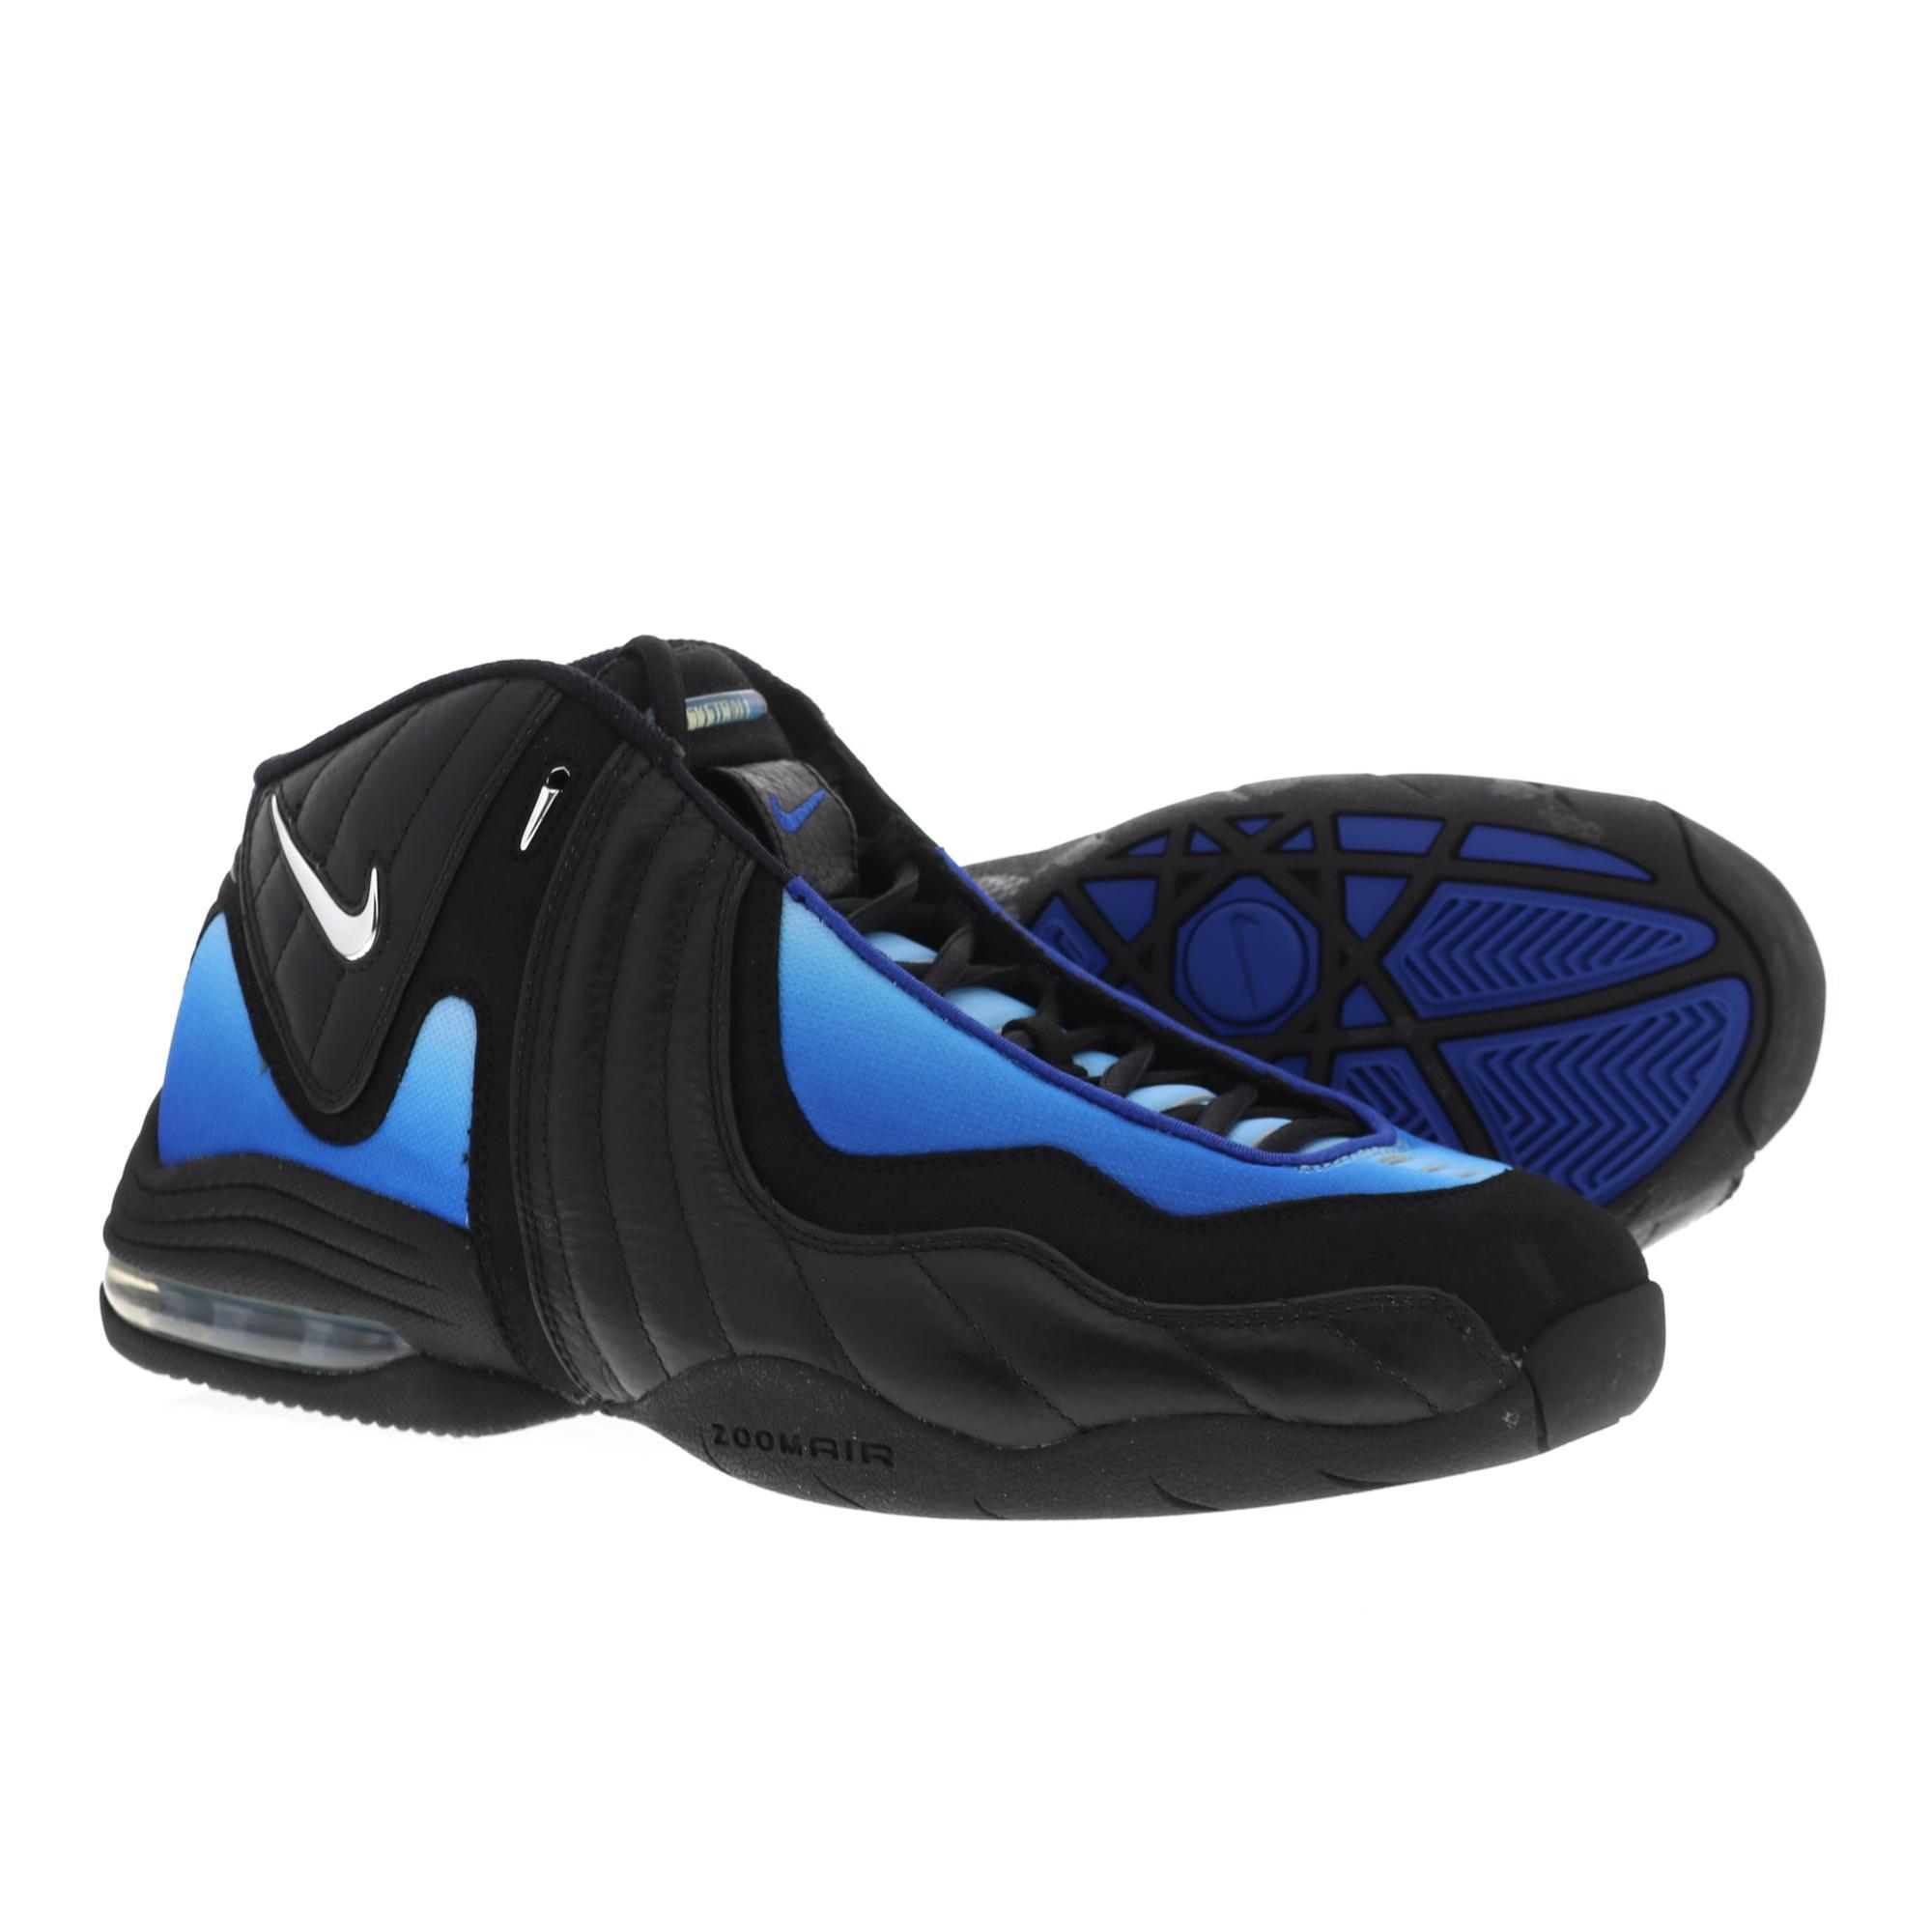 low priced 7bb47 cf197 Lot   329.  3  PAIRS  (1) Nike Air ...